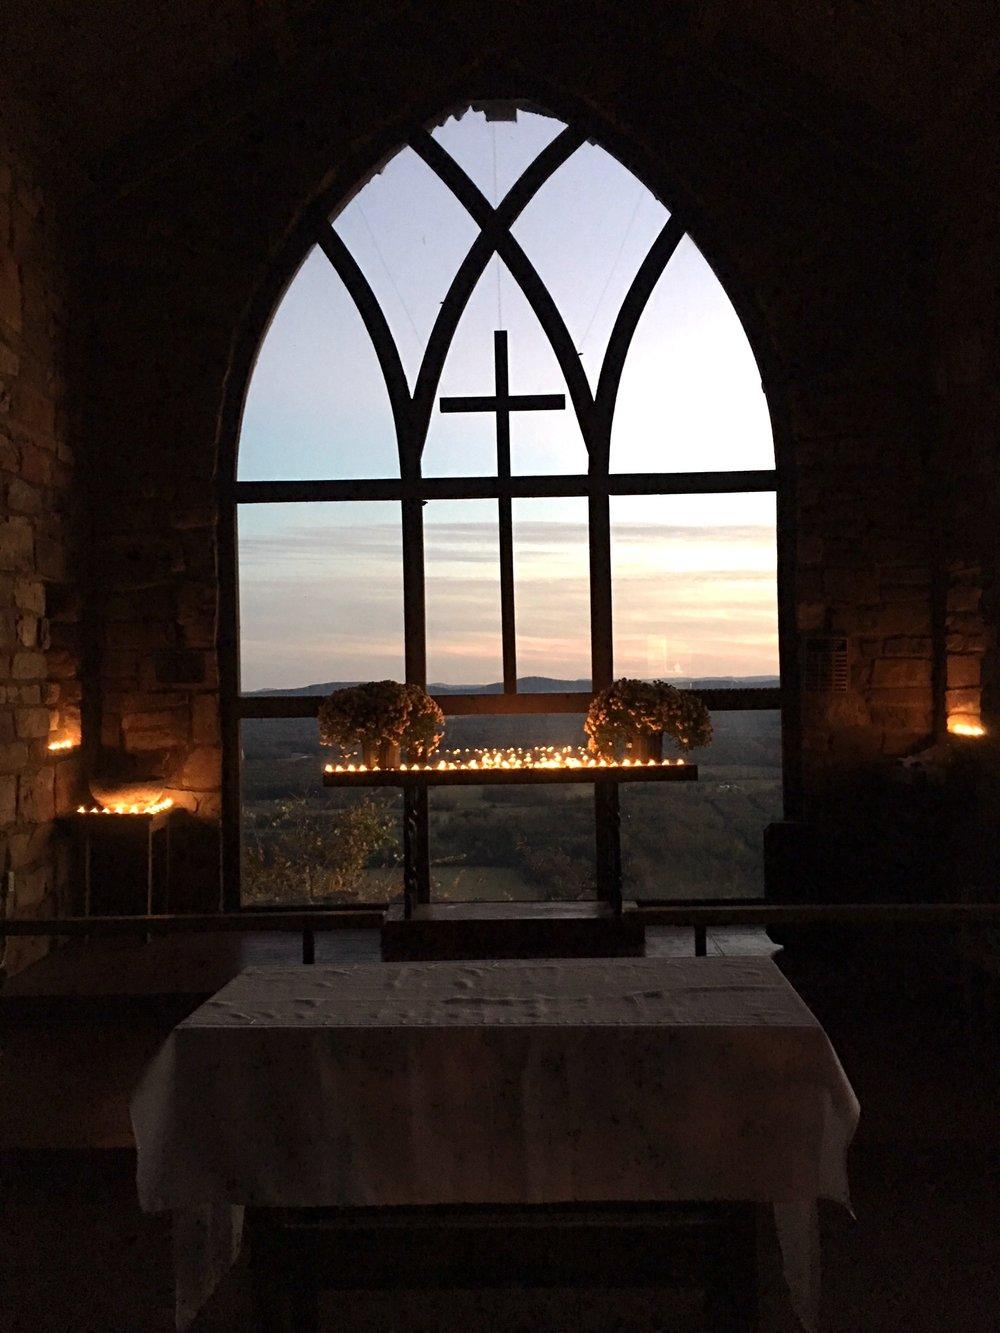 camp mitchell altar candles.JPG